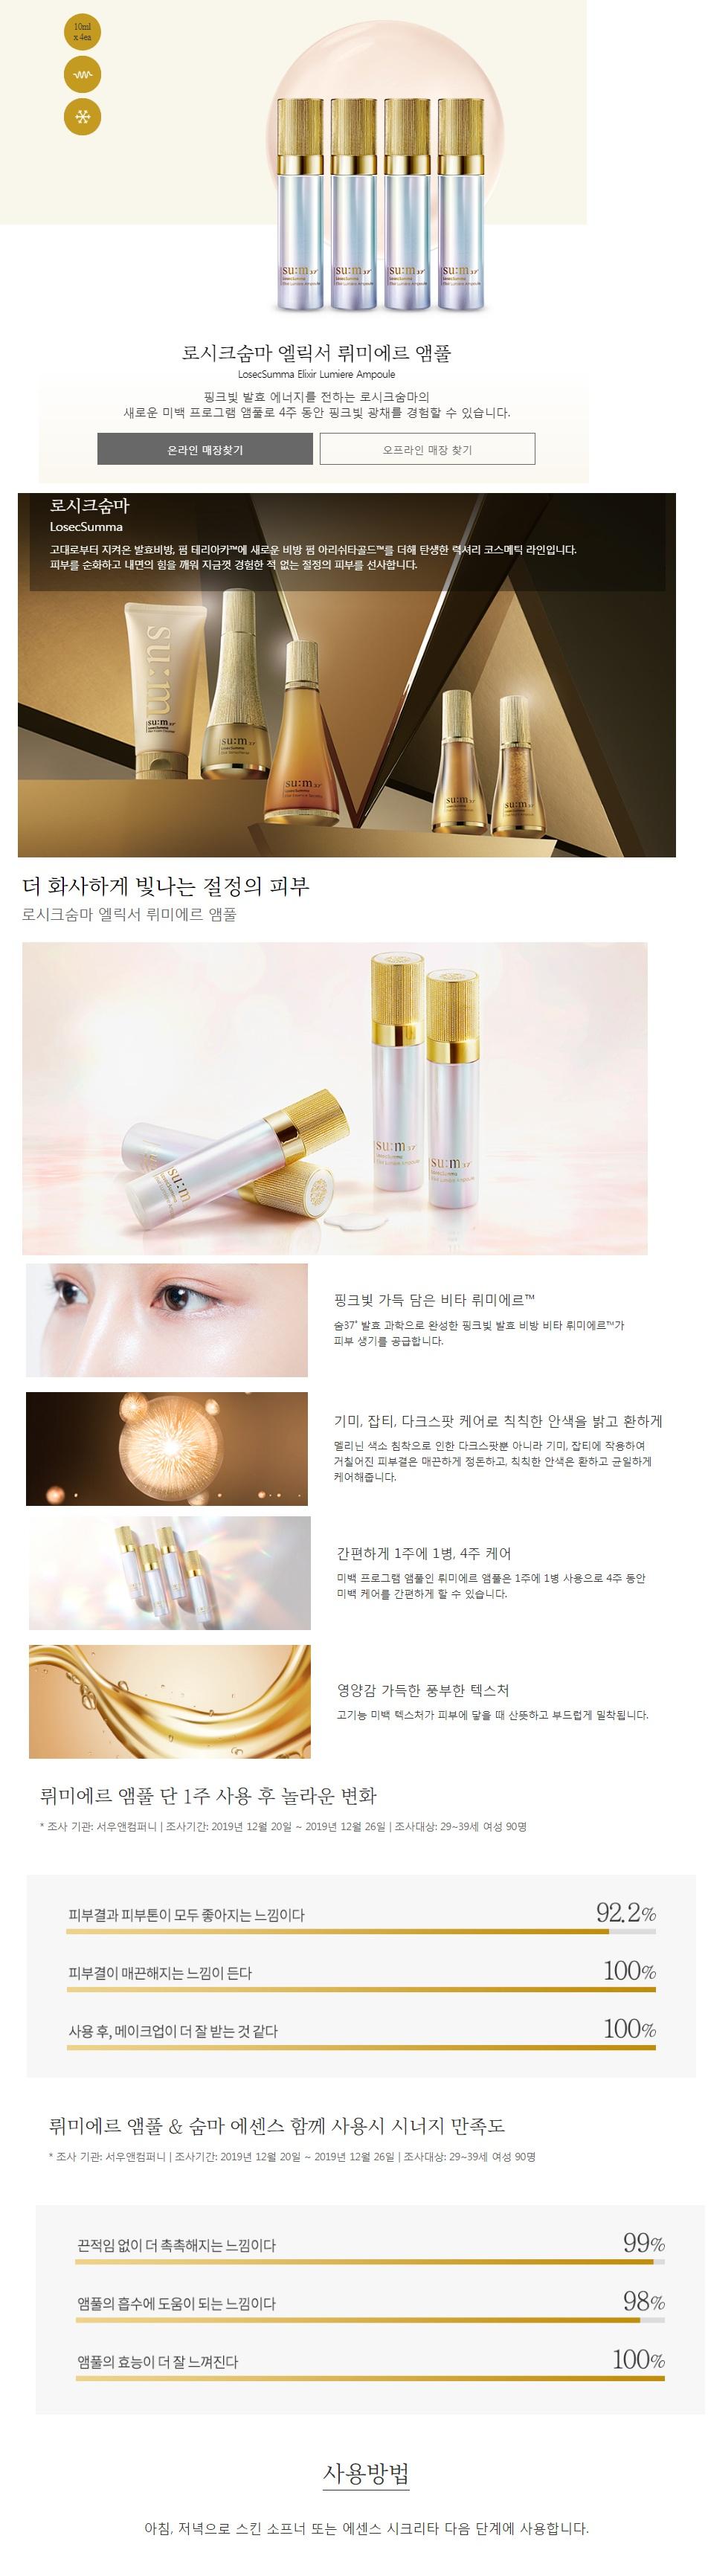 SUM37 Losec Summa Elixir Lumiere Ampoule korean skincare product online shop malaysia China japan